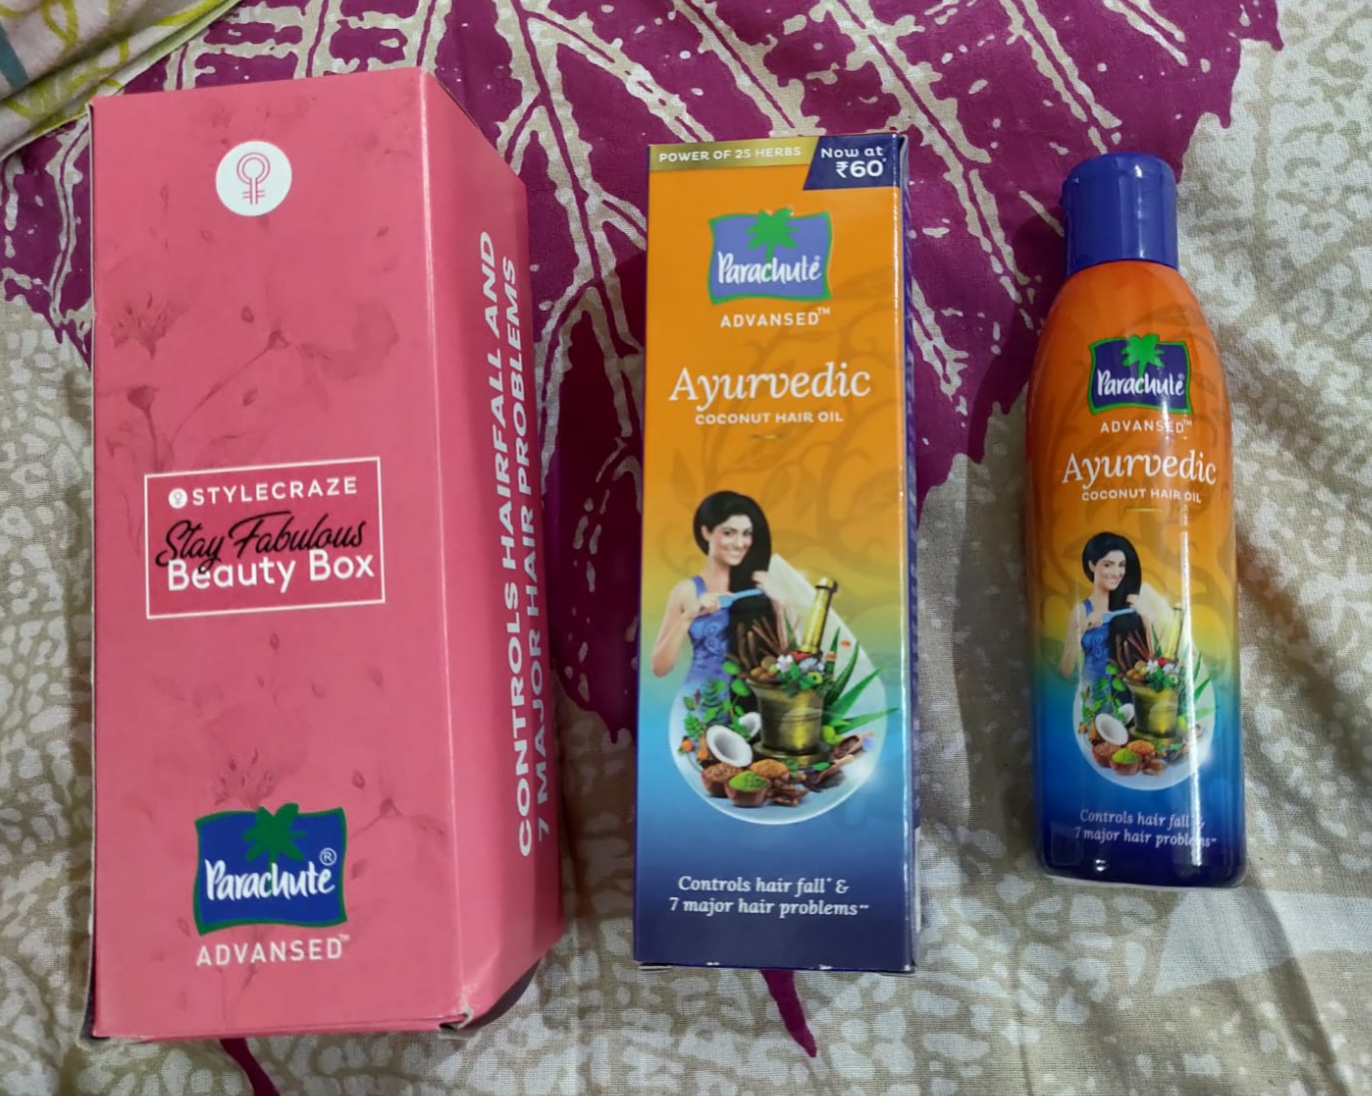 Parachute Advansed Ayurvedic Coconut Hair Oil-Best ayurvedic oil-By anjali_dewangan-1